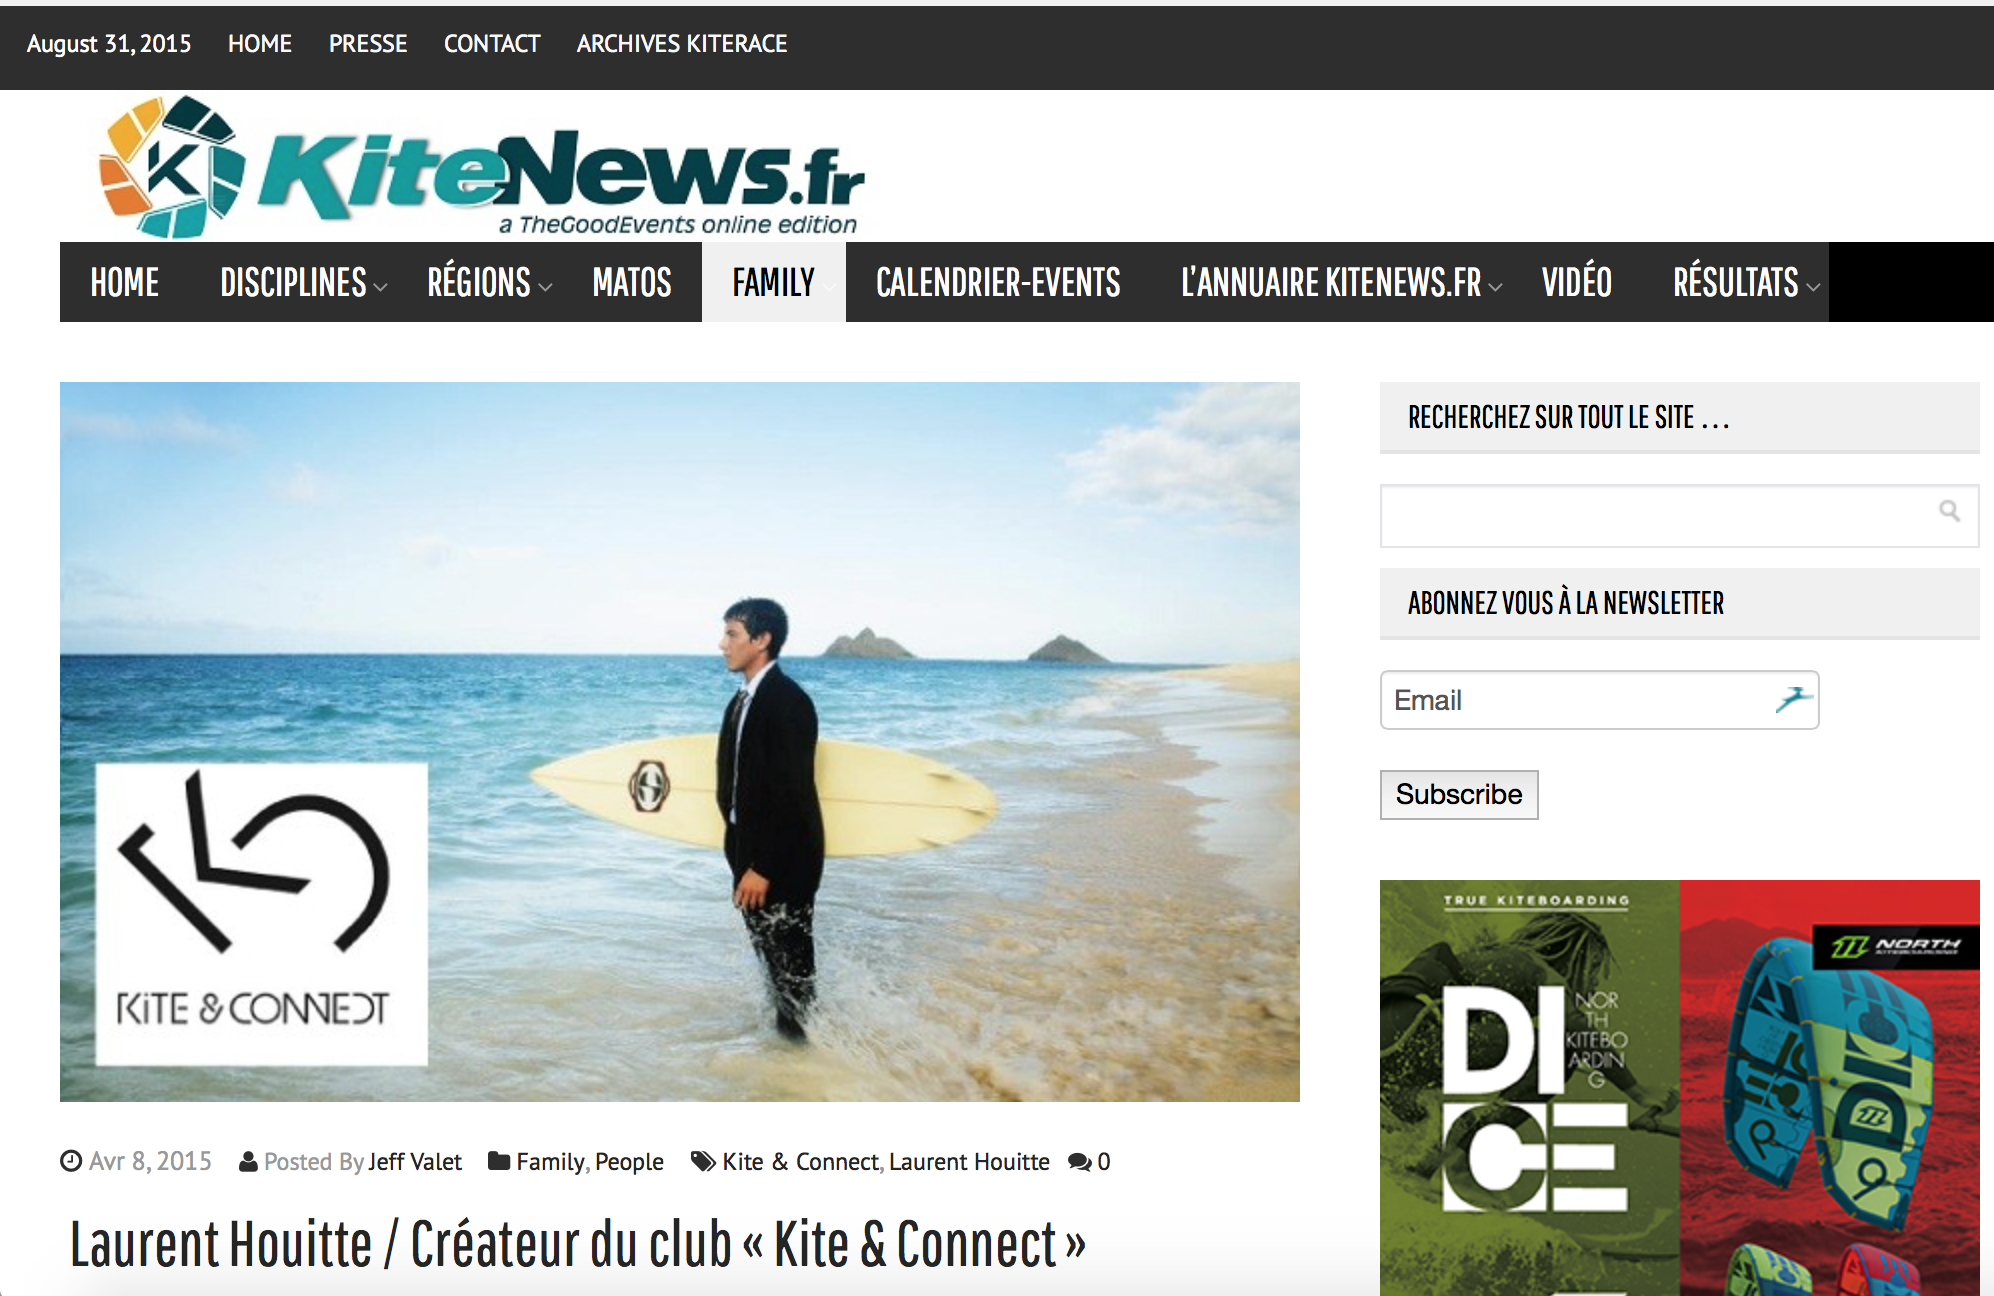 Kite News